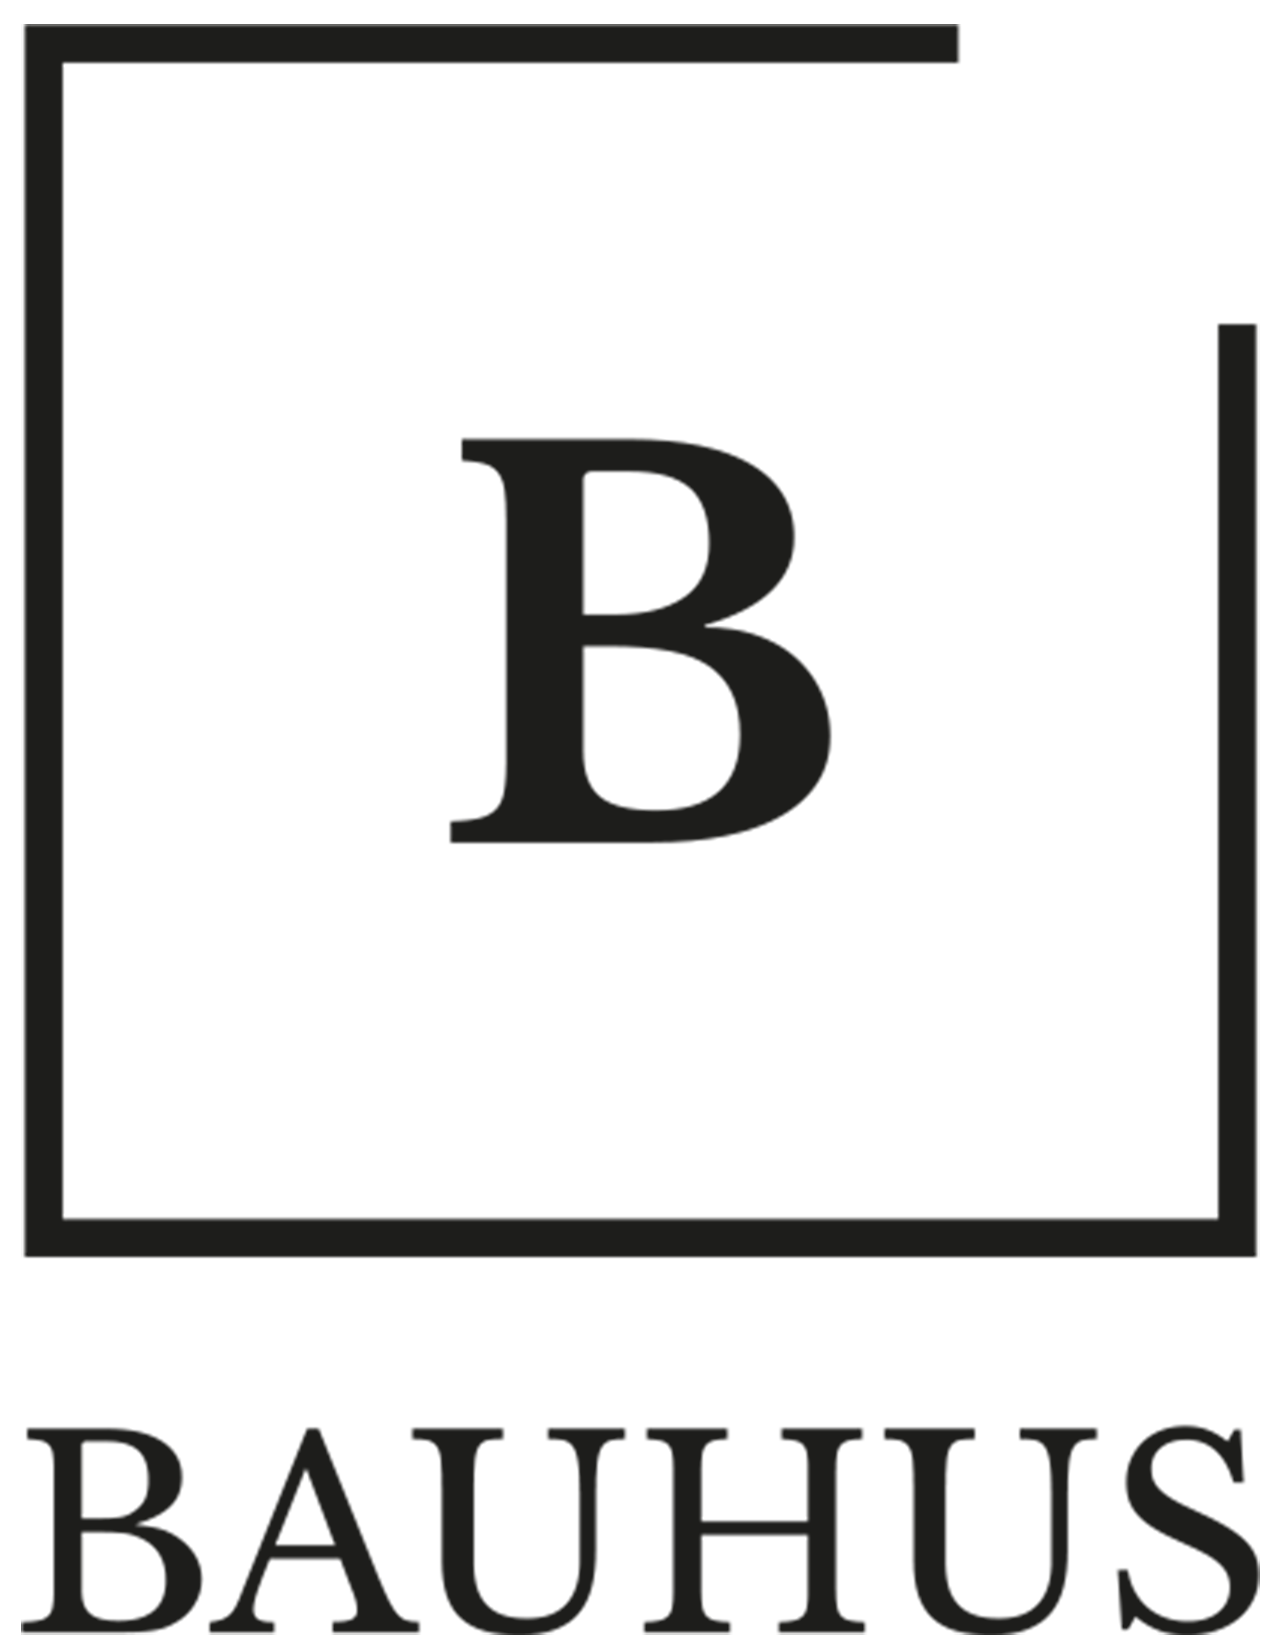 Producent Bauhus - Profesjonlna Chemia Budowlana